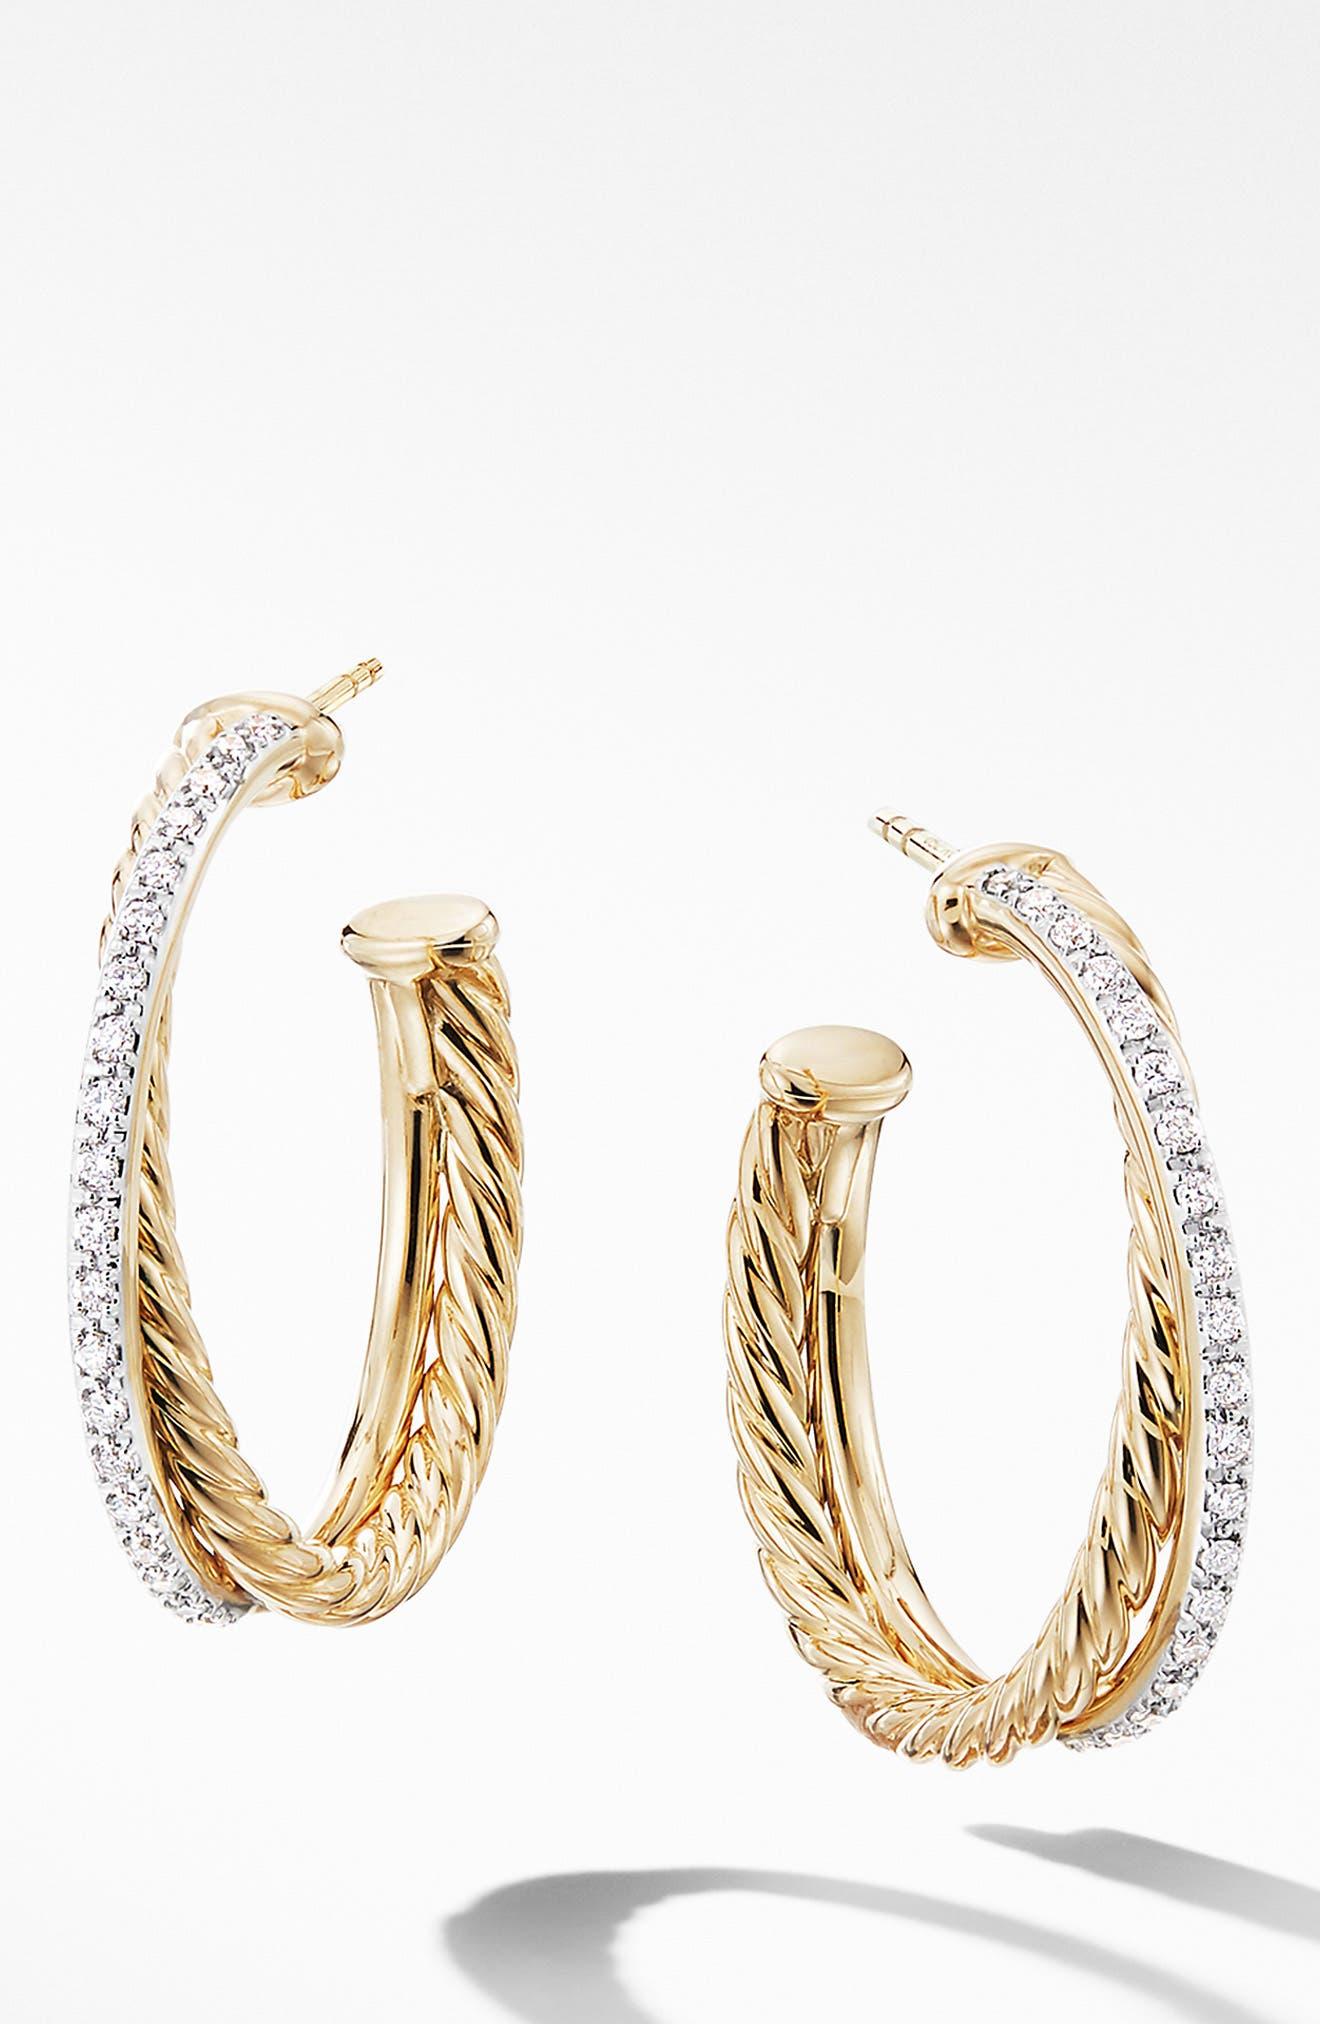 DAVID YURMAN, Medium Crossover Hoop Earrings with Diamonds, Main thumbnail 1, color, GOLD/ DIAMOND